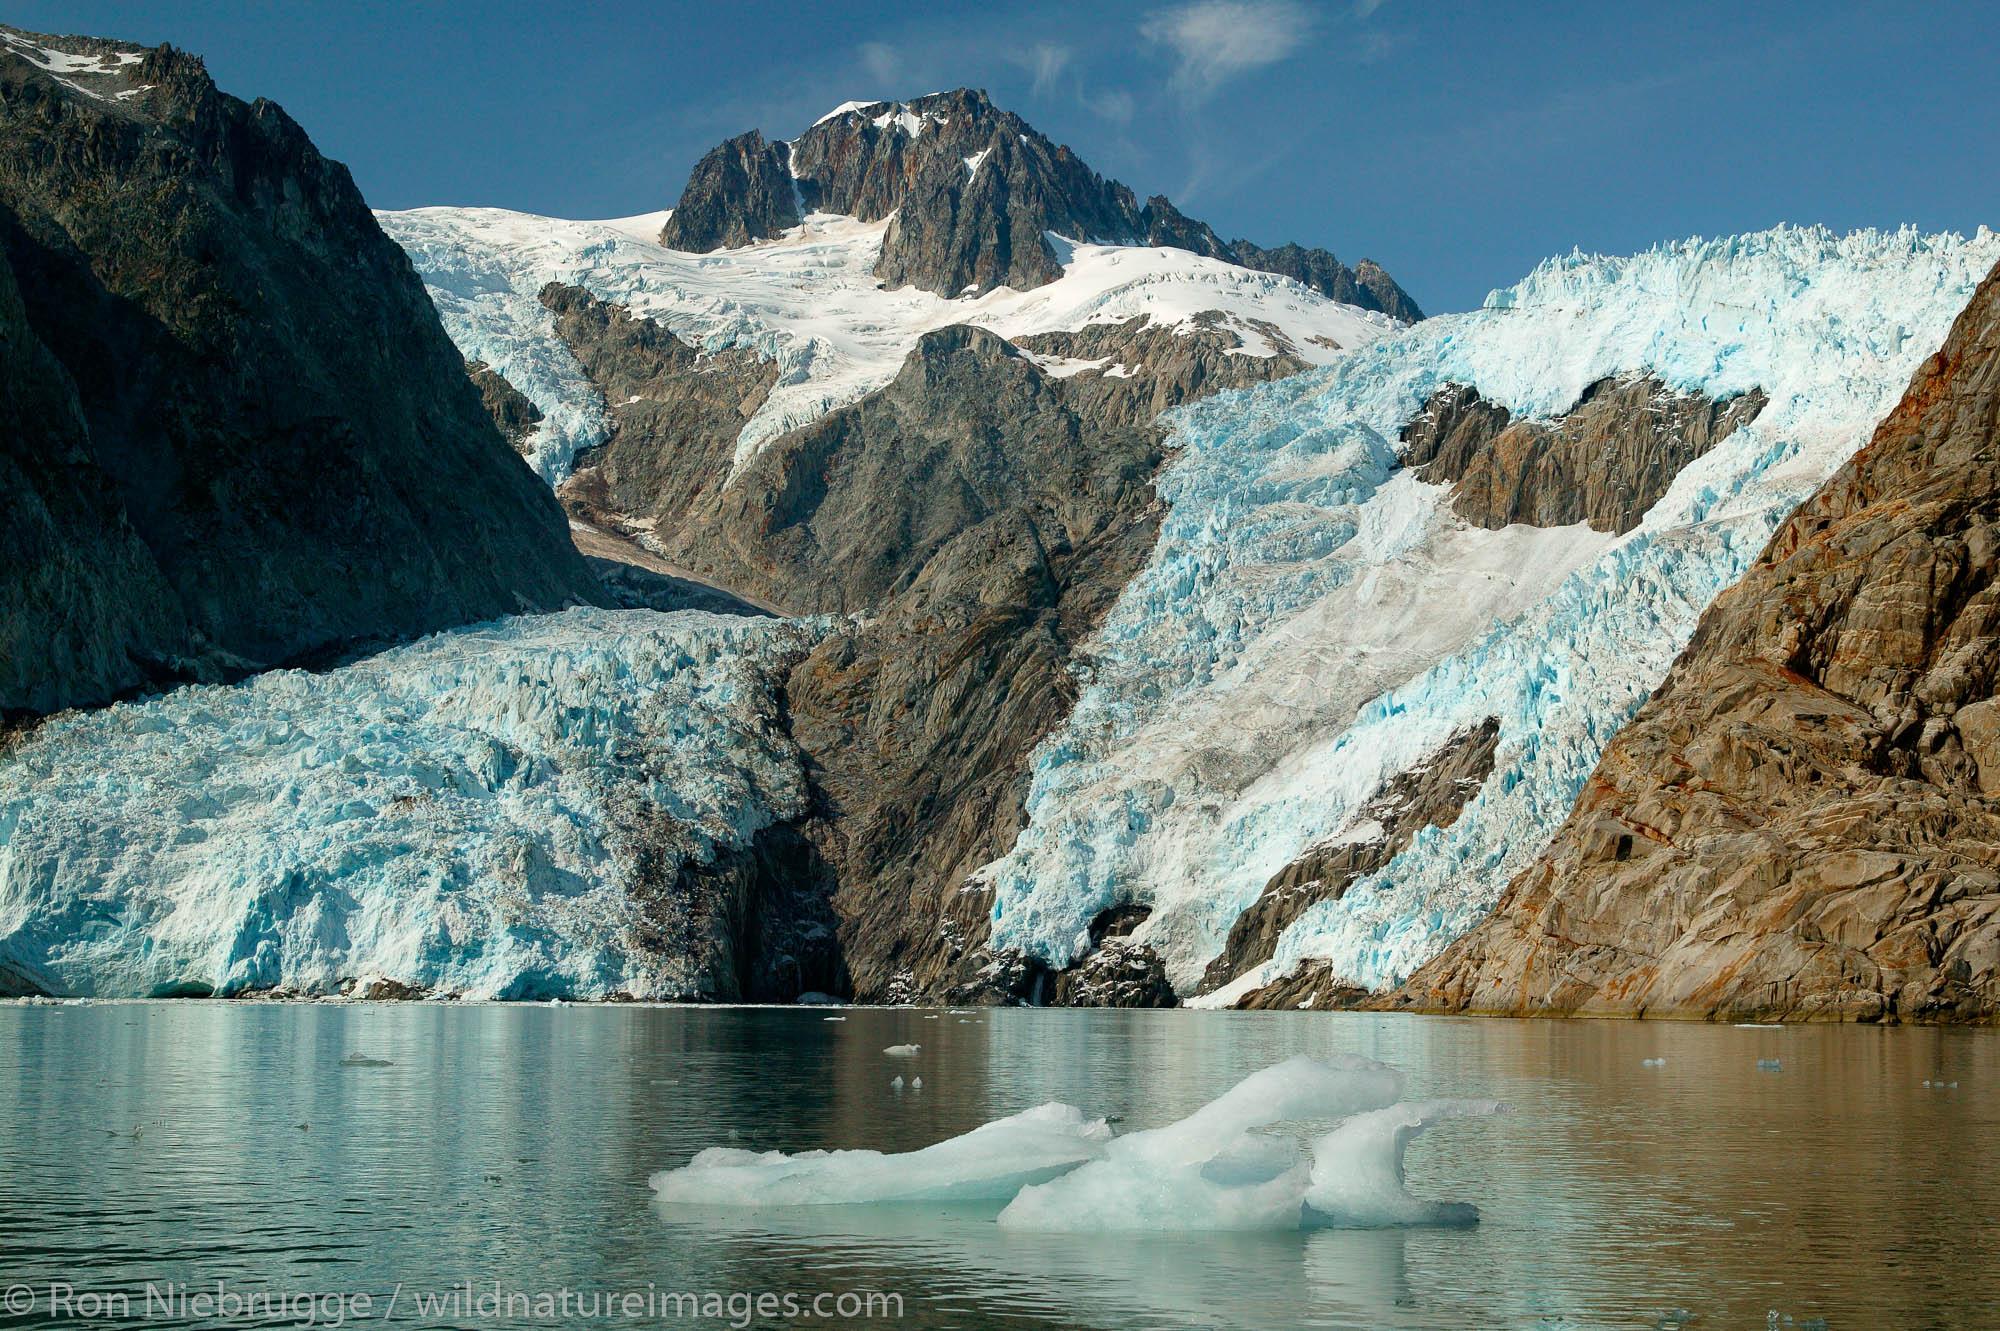 Northwestern Glacier and Fjord, Kenai Fjords National Park, Alaska.